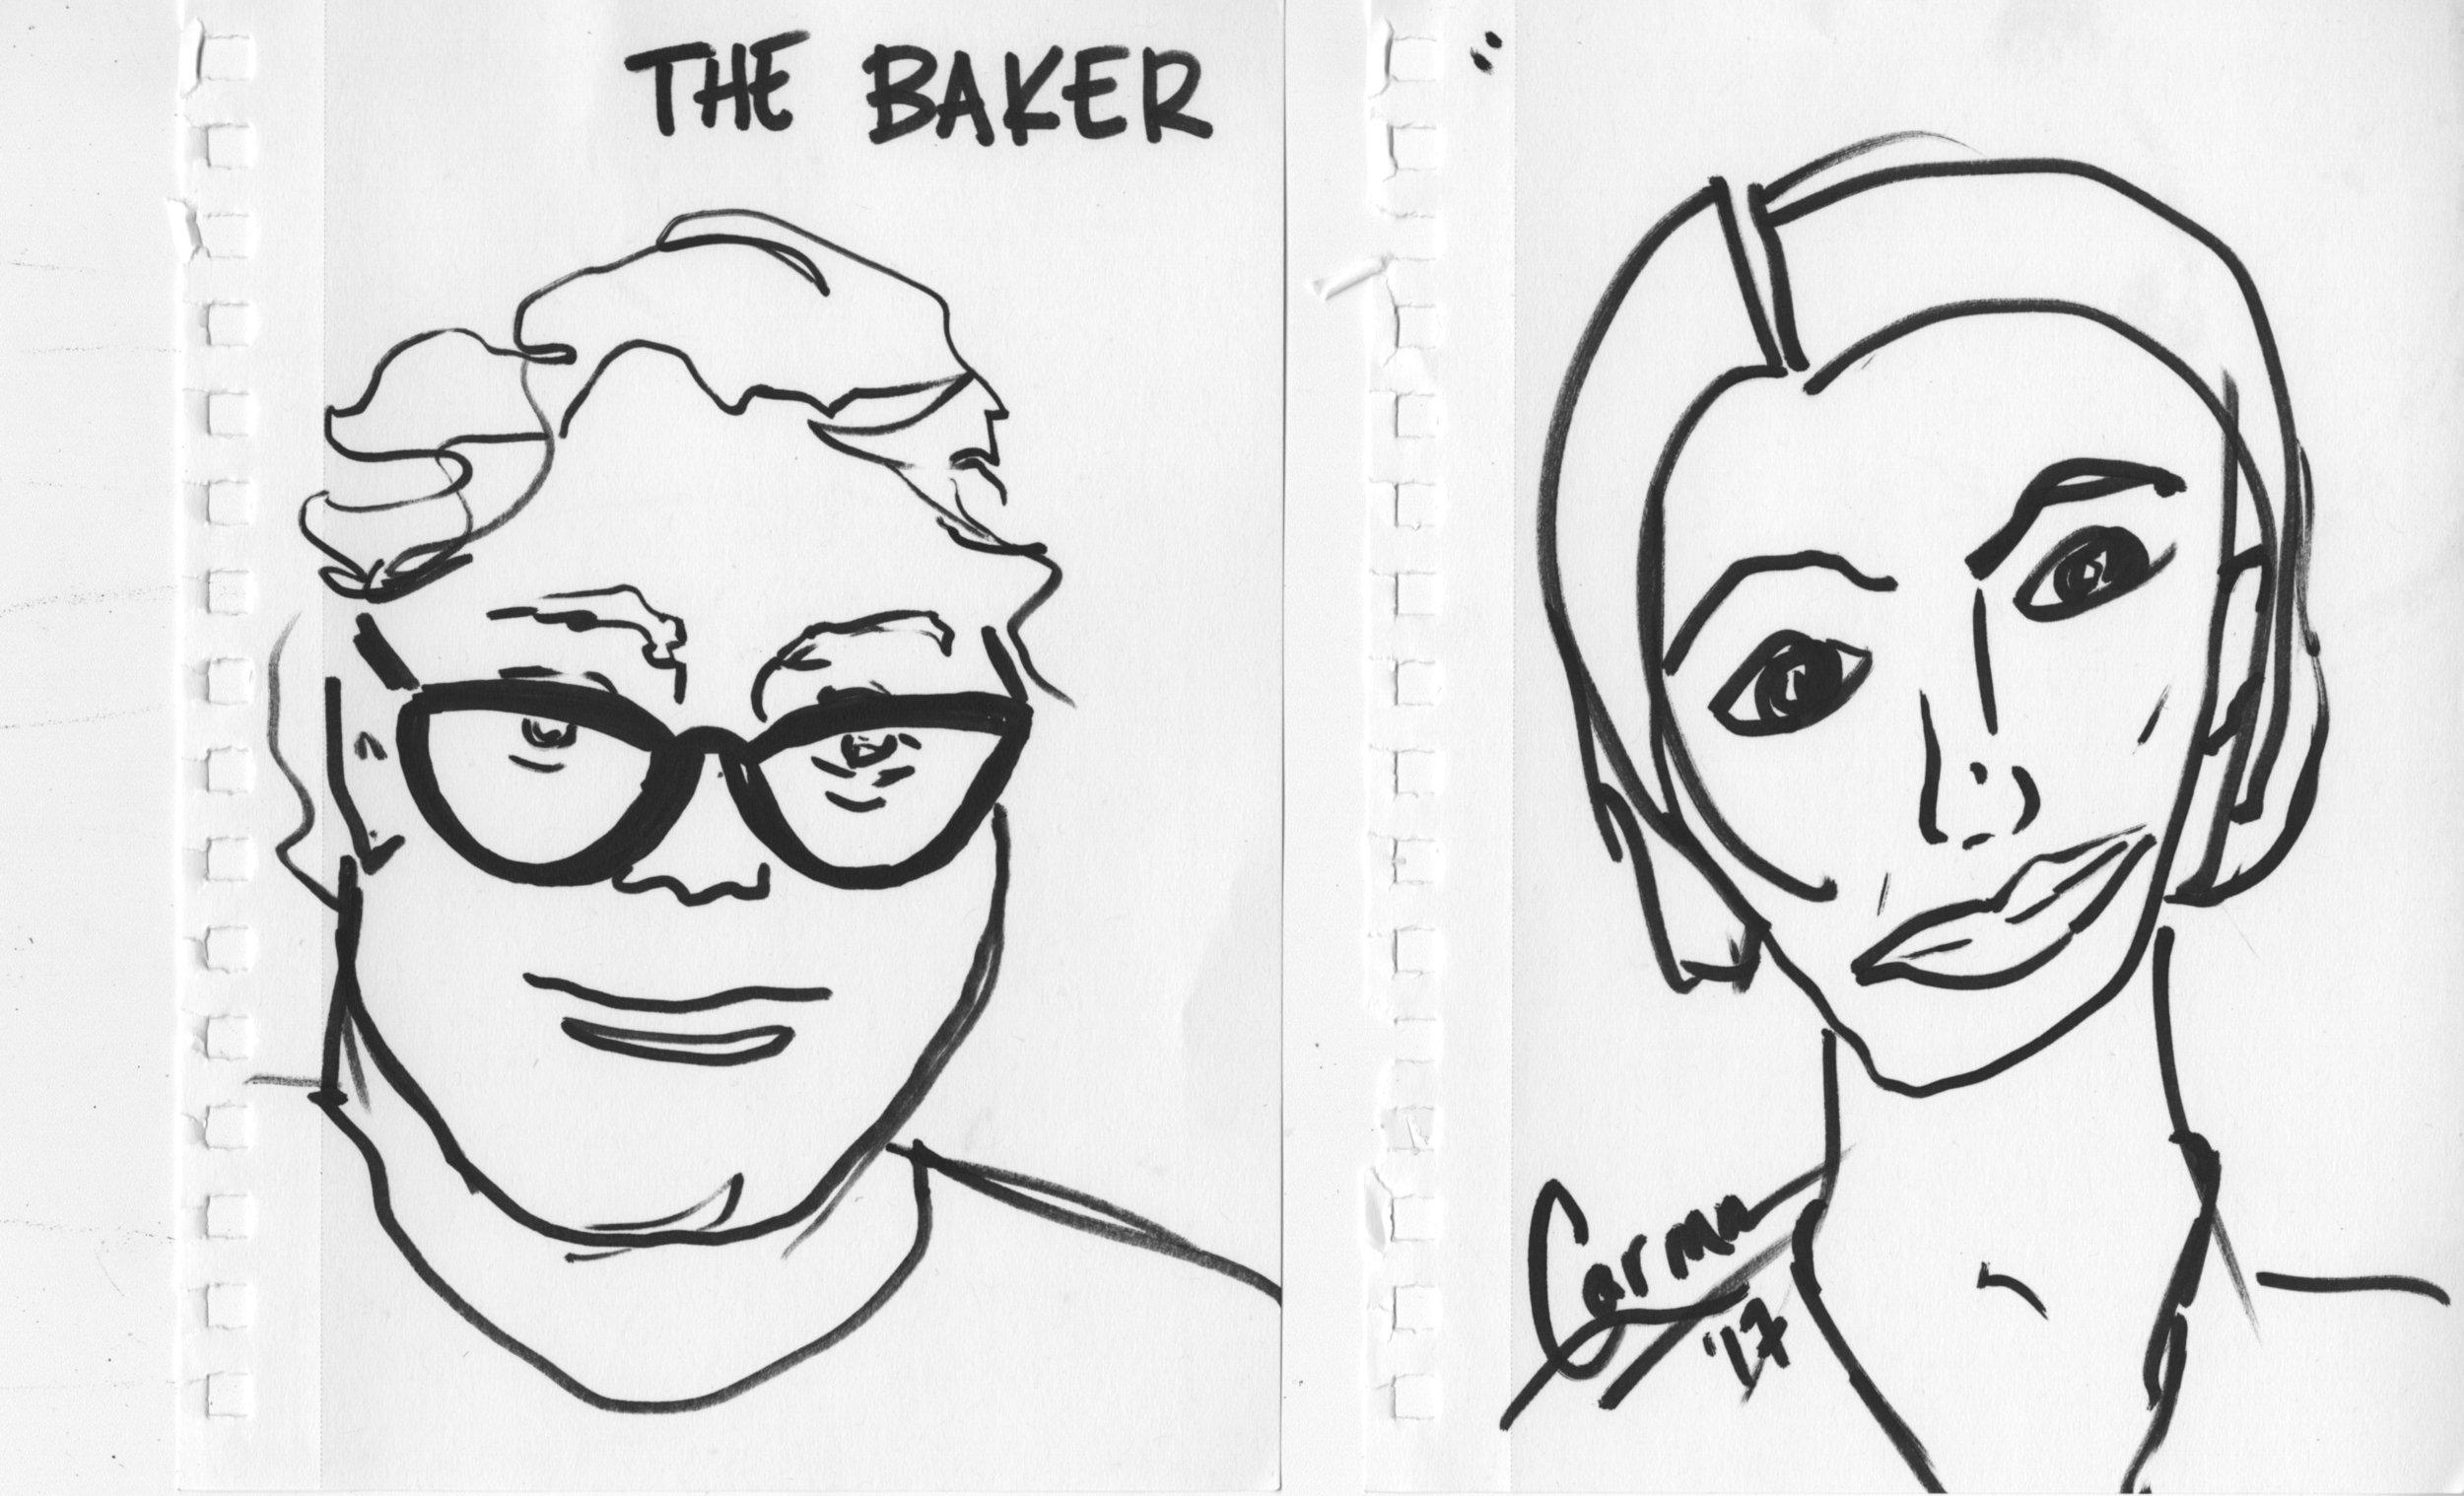 54_Carma_The Baker.jpg